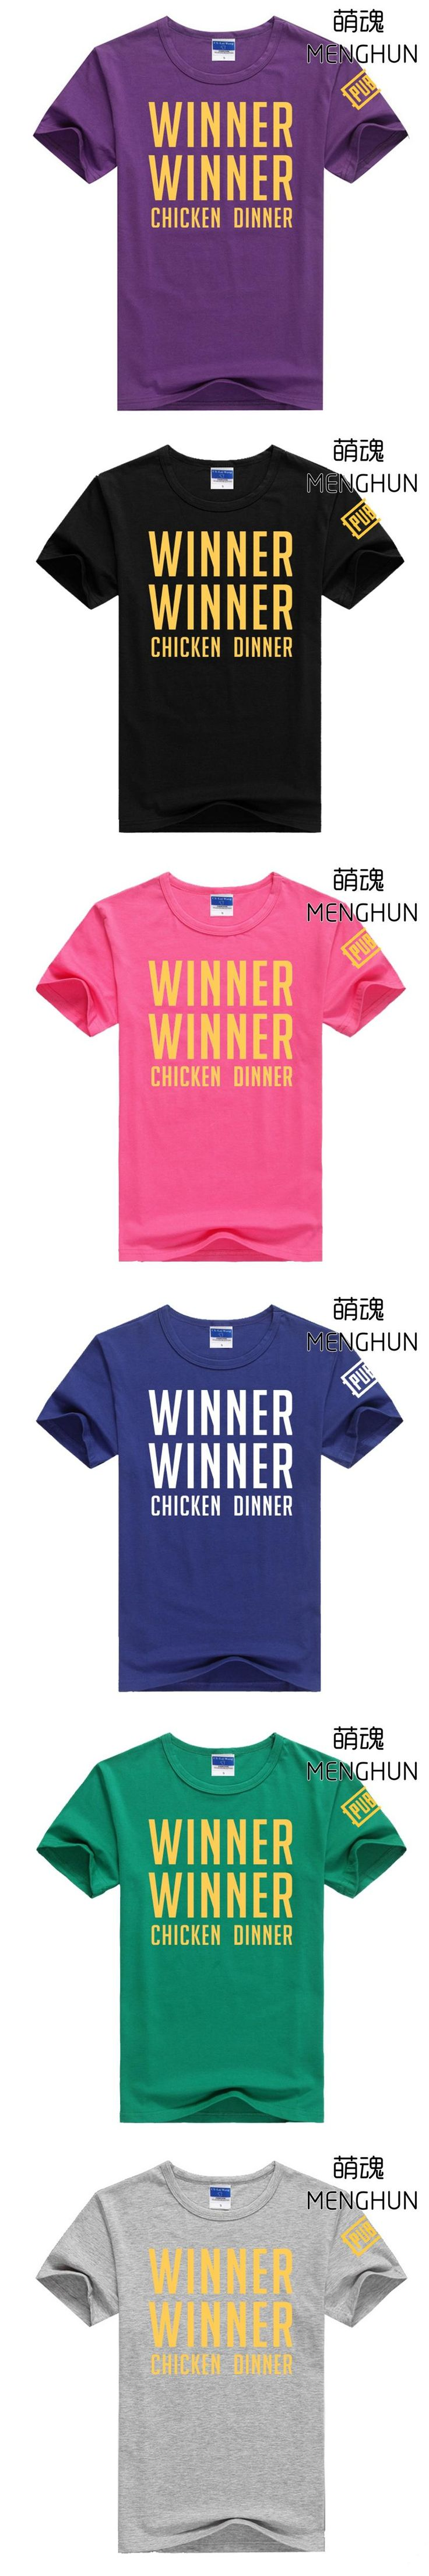 2017 COOL new world hot FPS game Player unknown's Battlegrounds t shirts PUBG Winner Winner Chicken dinner t shirts ac671